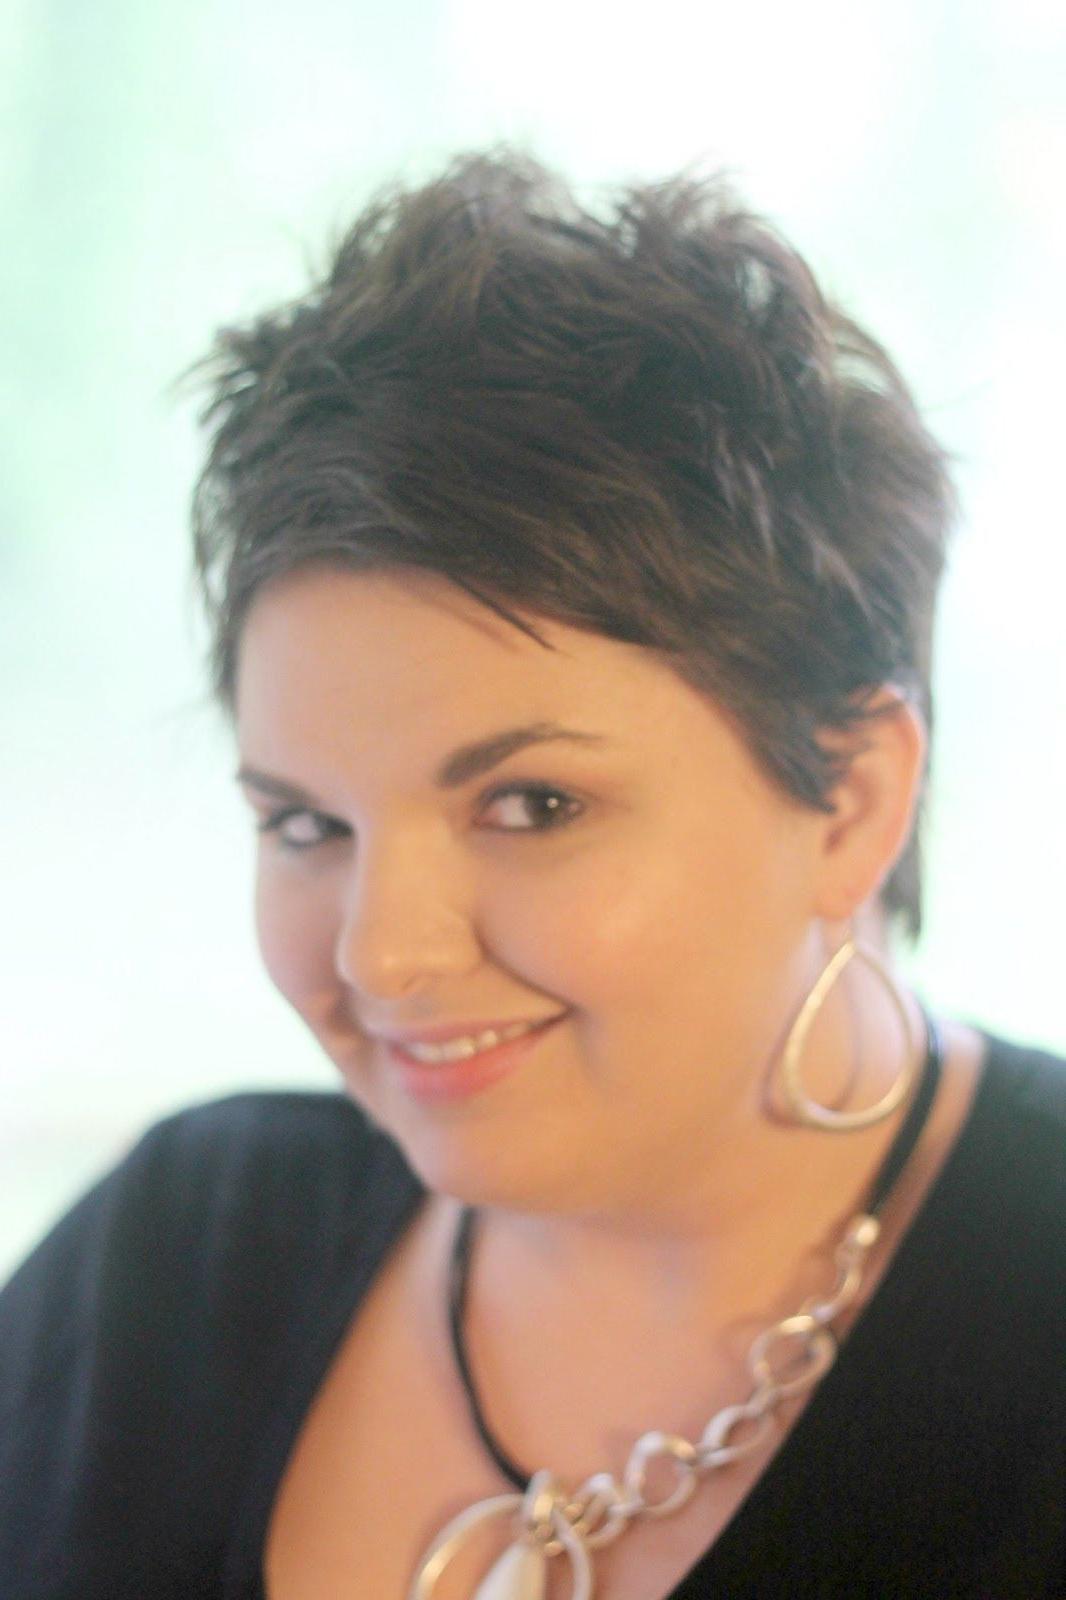 Lisa Farrell   Hair Styles   Pinterest   Short Hair Styles, Hair And Within Short Hairstyles For Obese Faces (View 4 of 25)